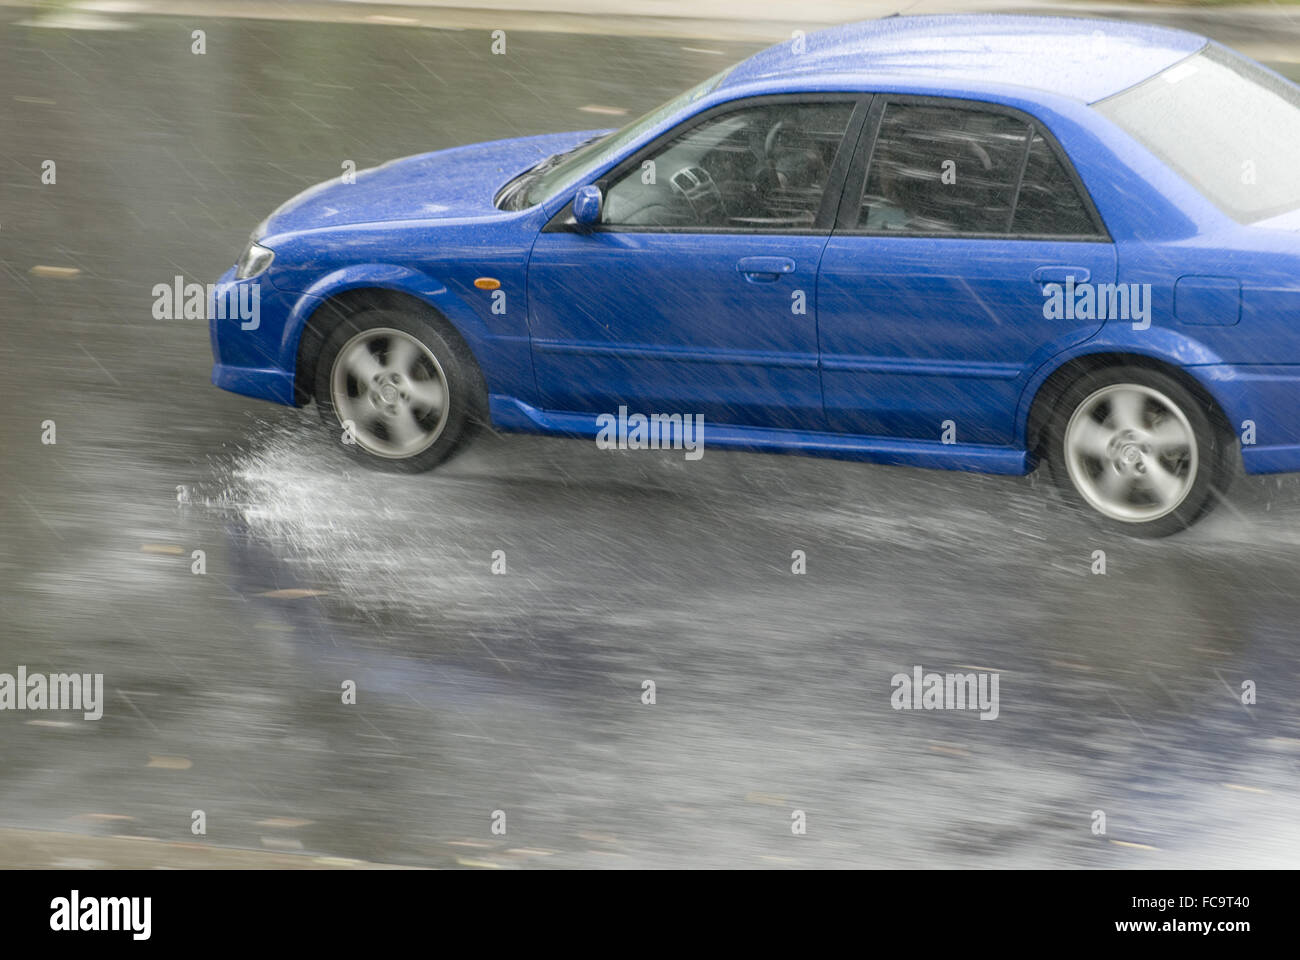 rainstorm - Stock Image